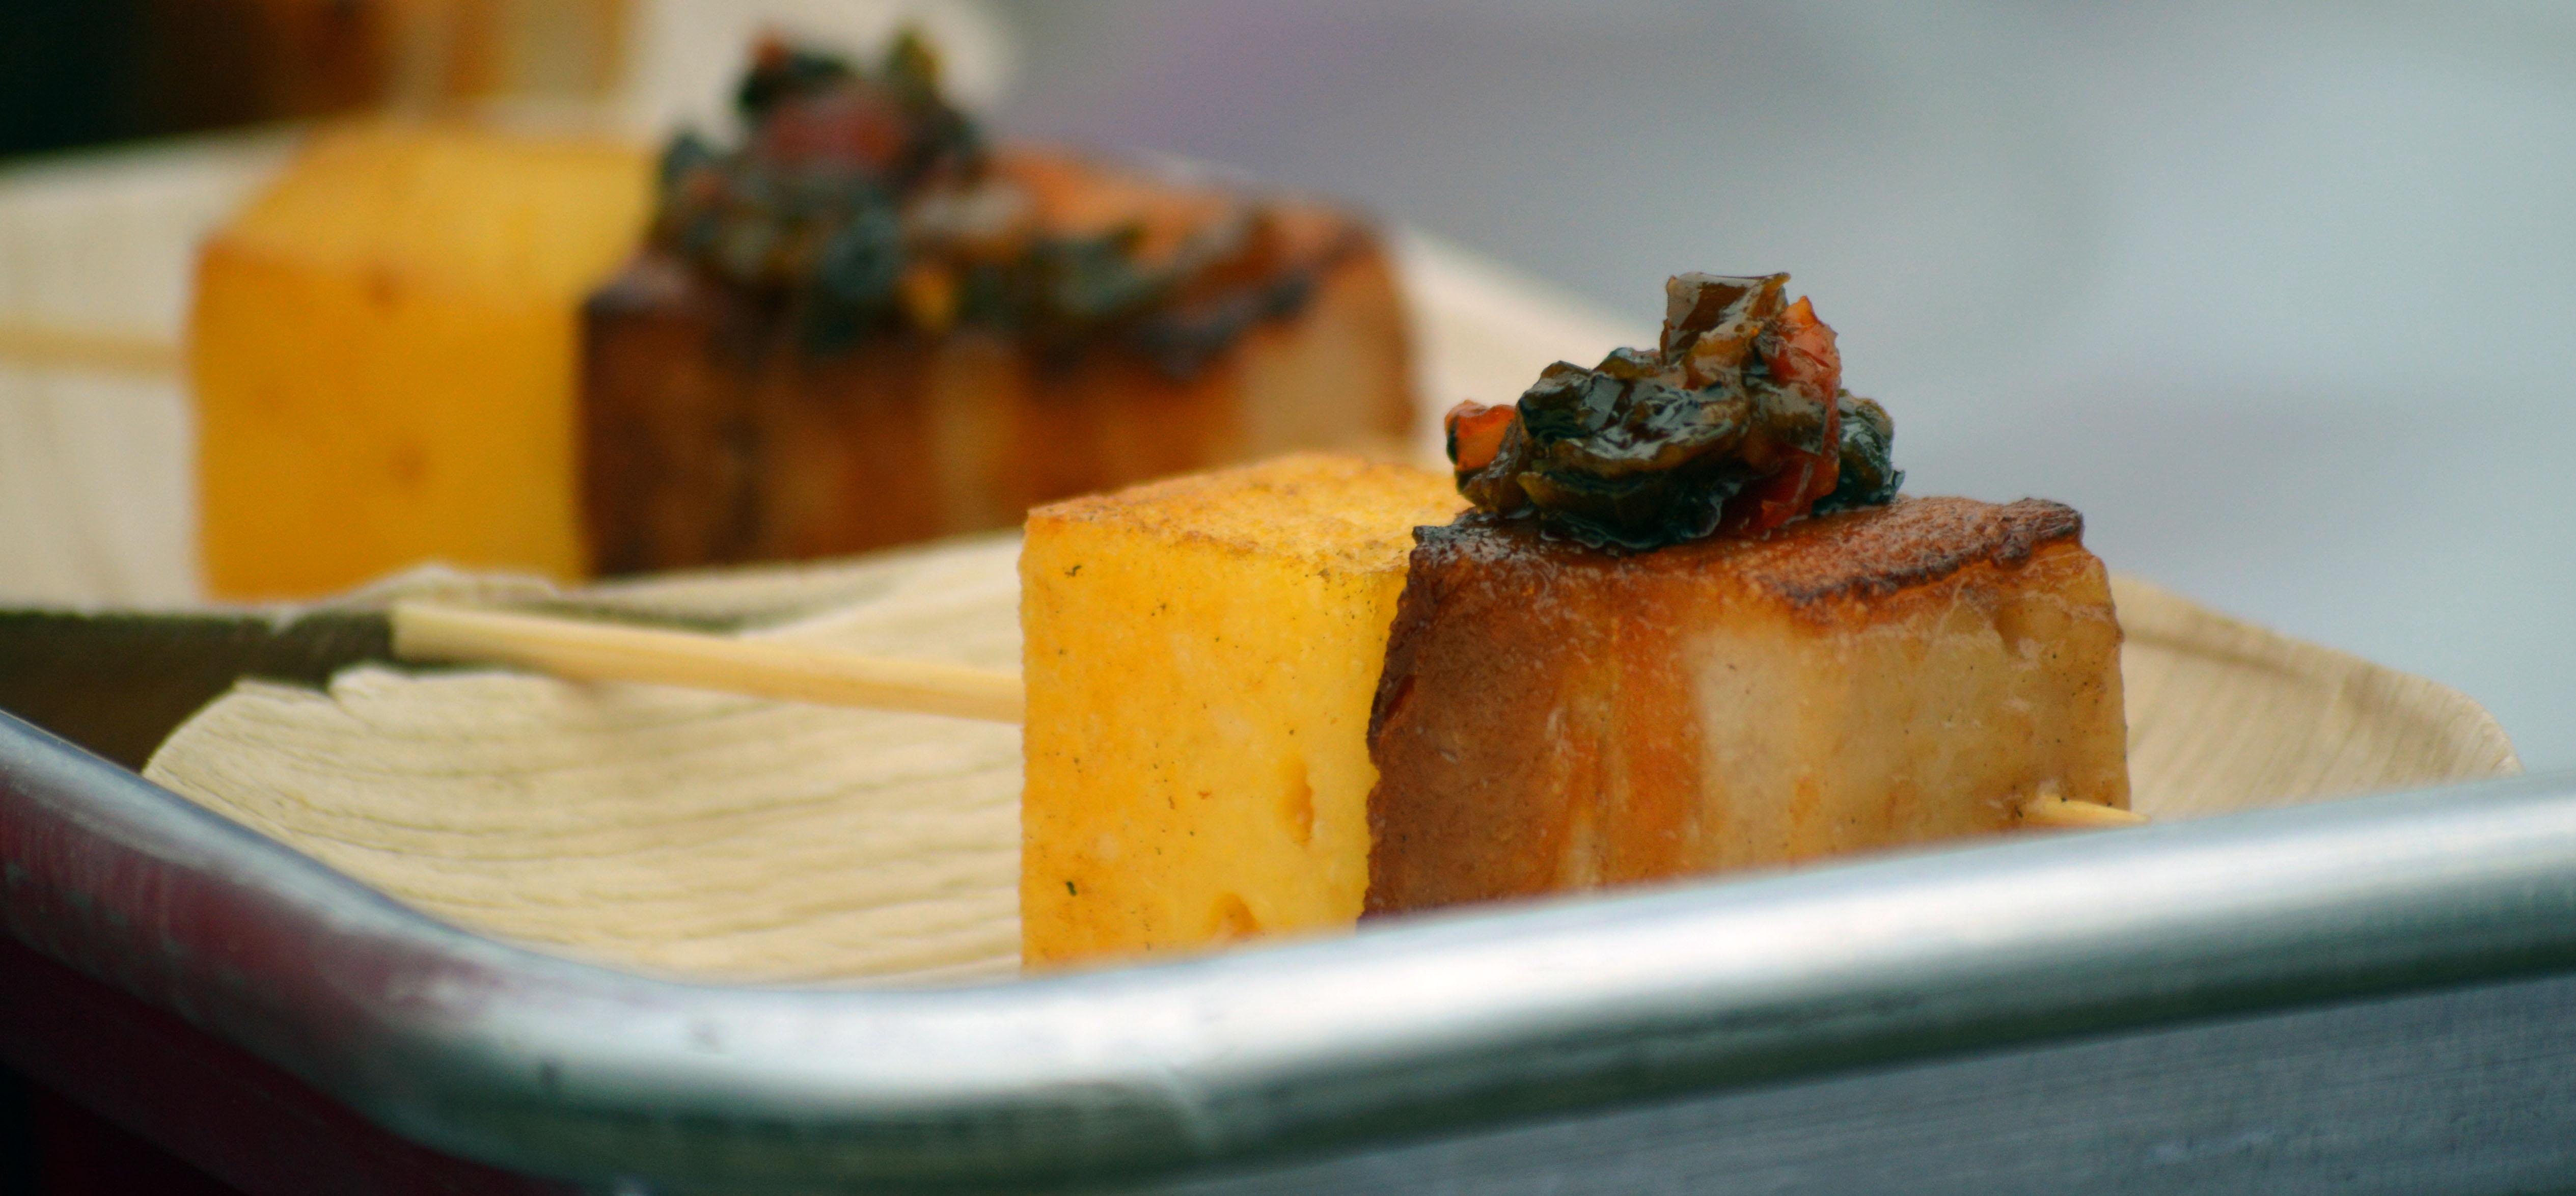 grilling with carmen quagliata